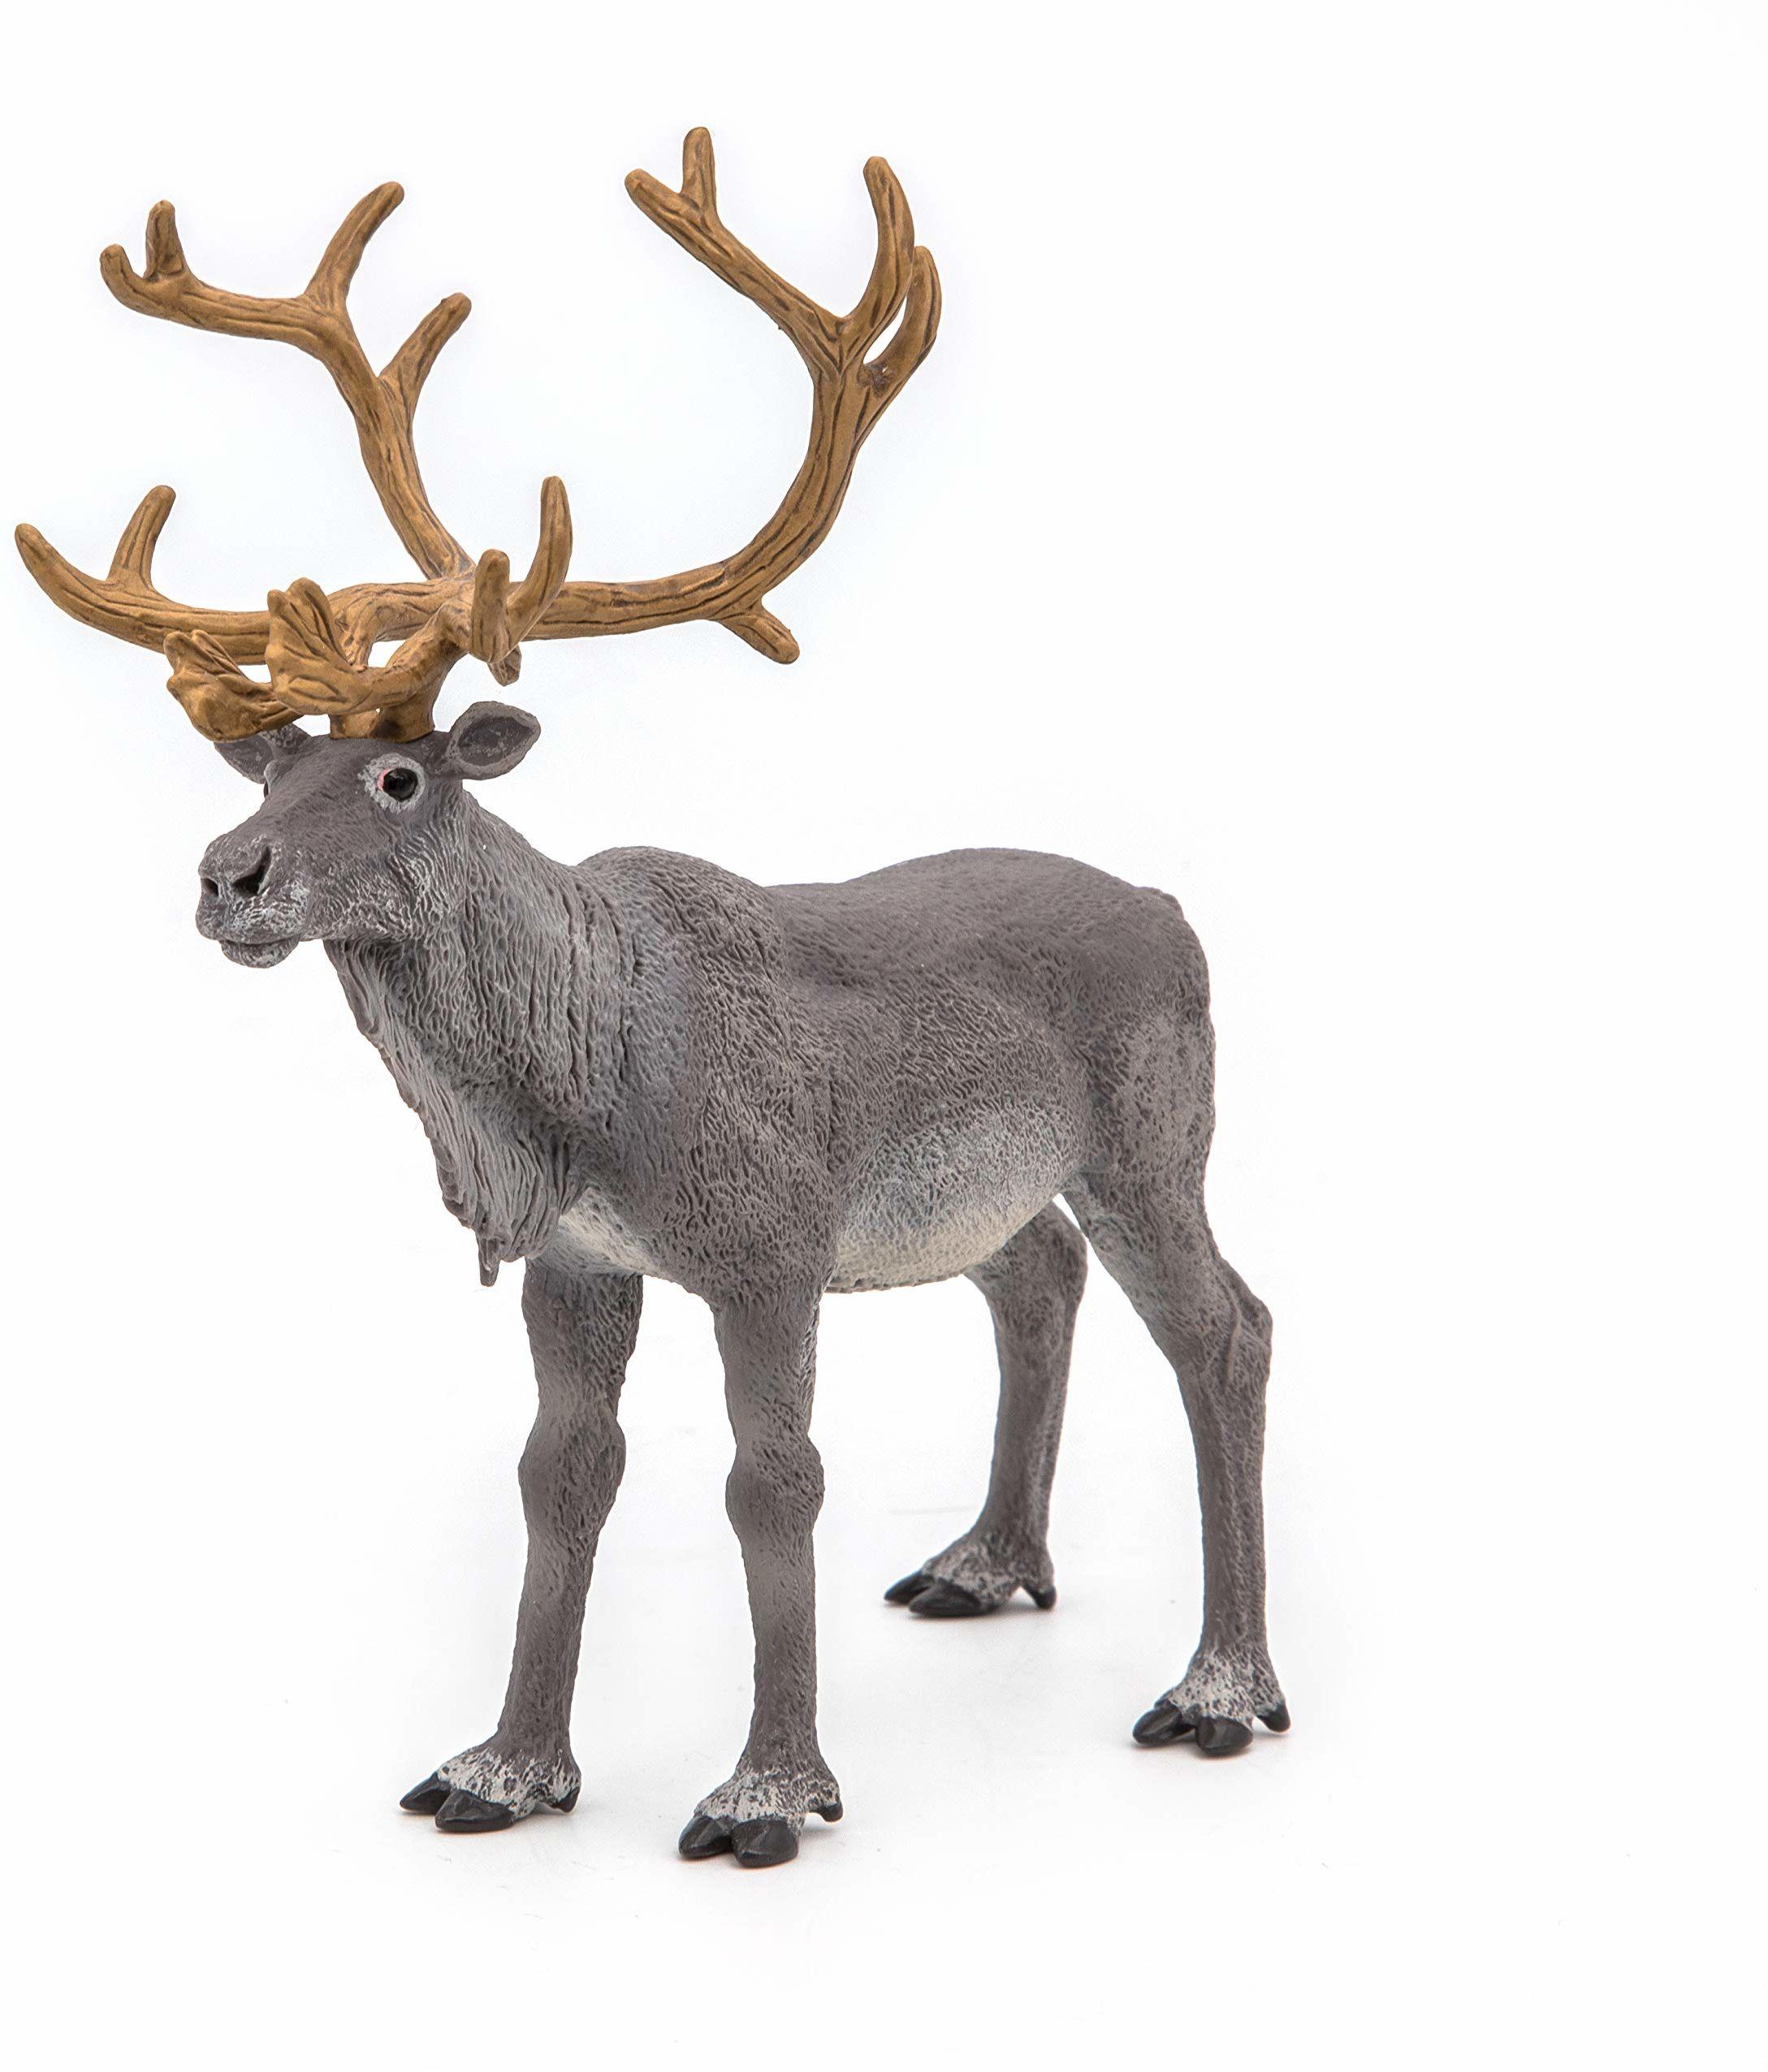 Papo 50117 Renifer Wild Animal Figurka Królestwa, Wielokolorowa